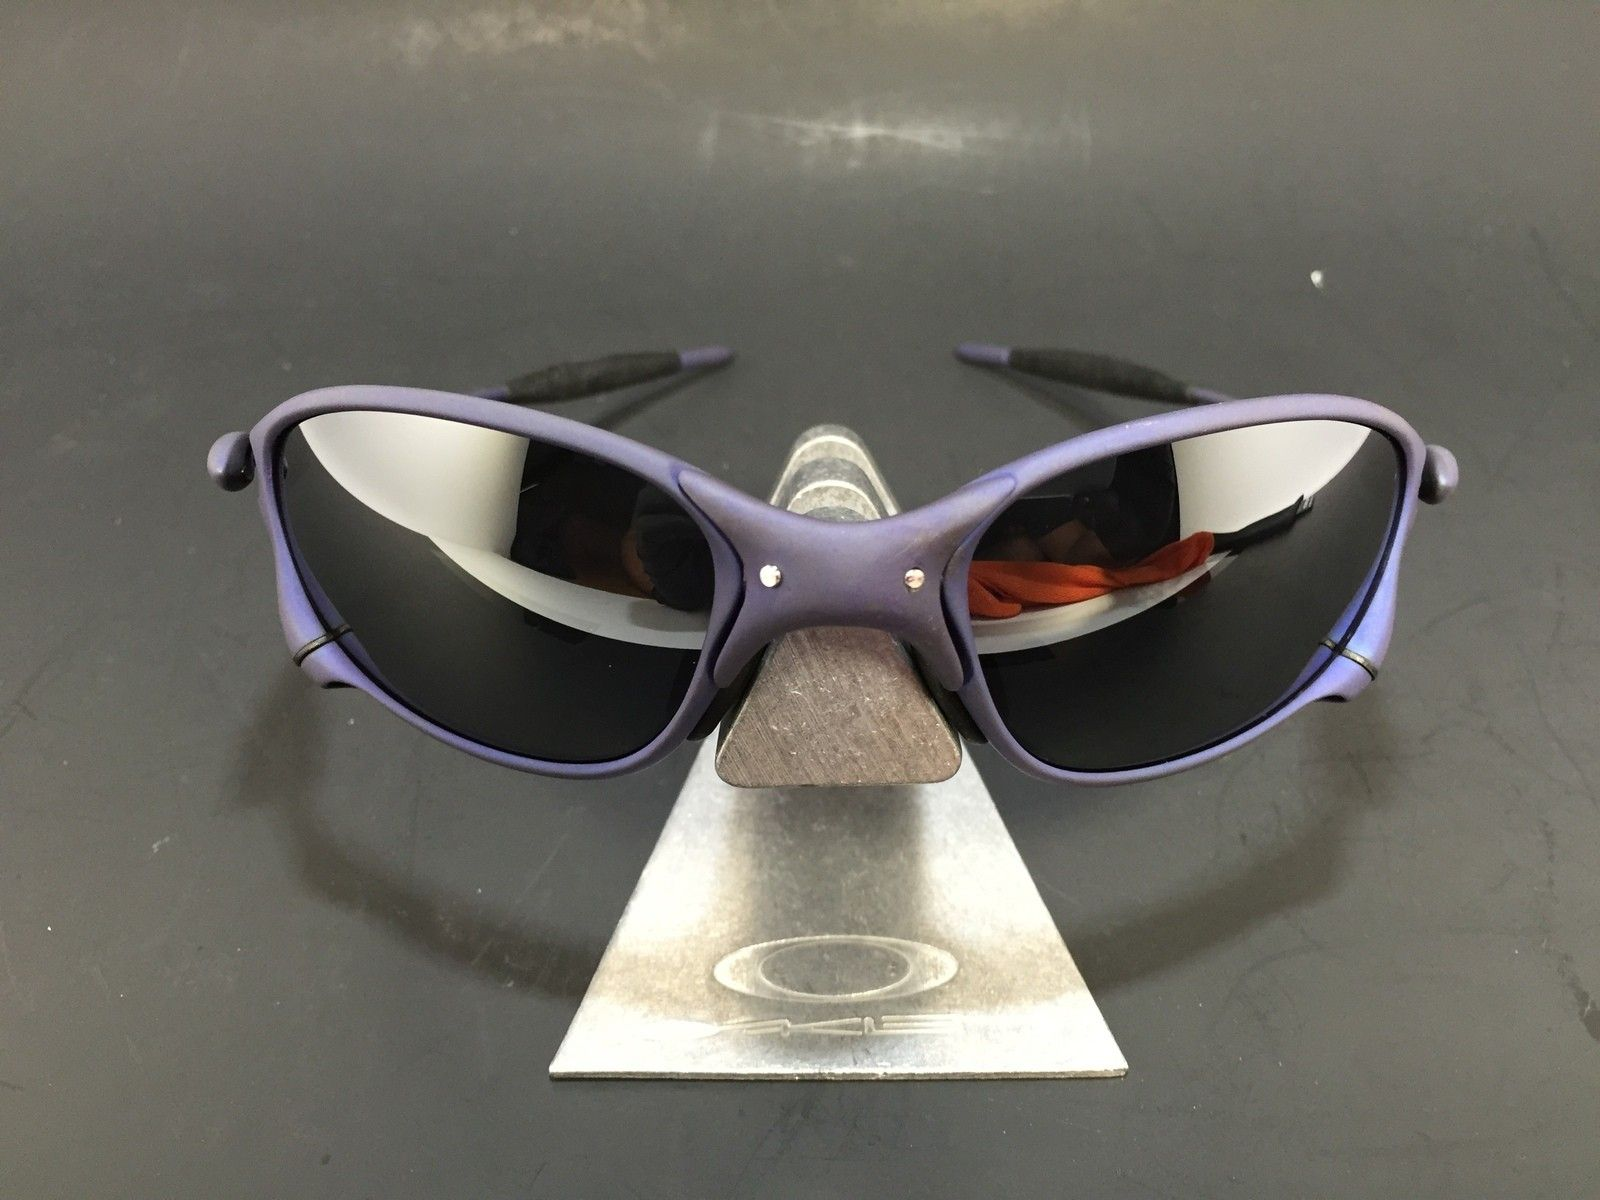 Anodized Purple X-Metal Finish XX Frame w/ OEM New Black Lenses - IMG_1851.JPG